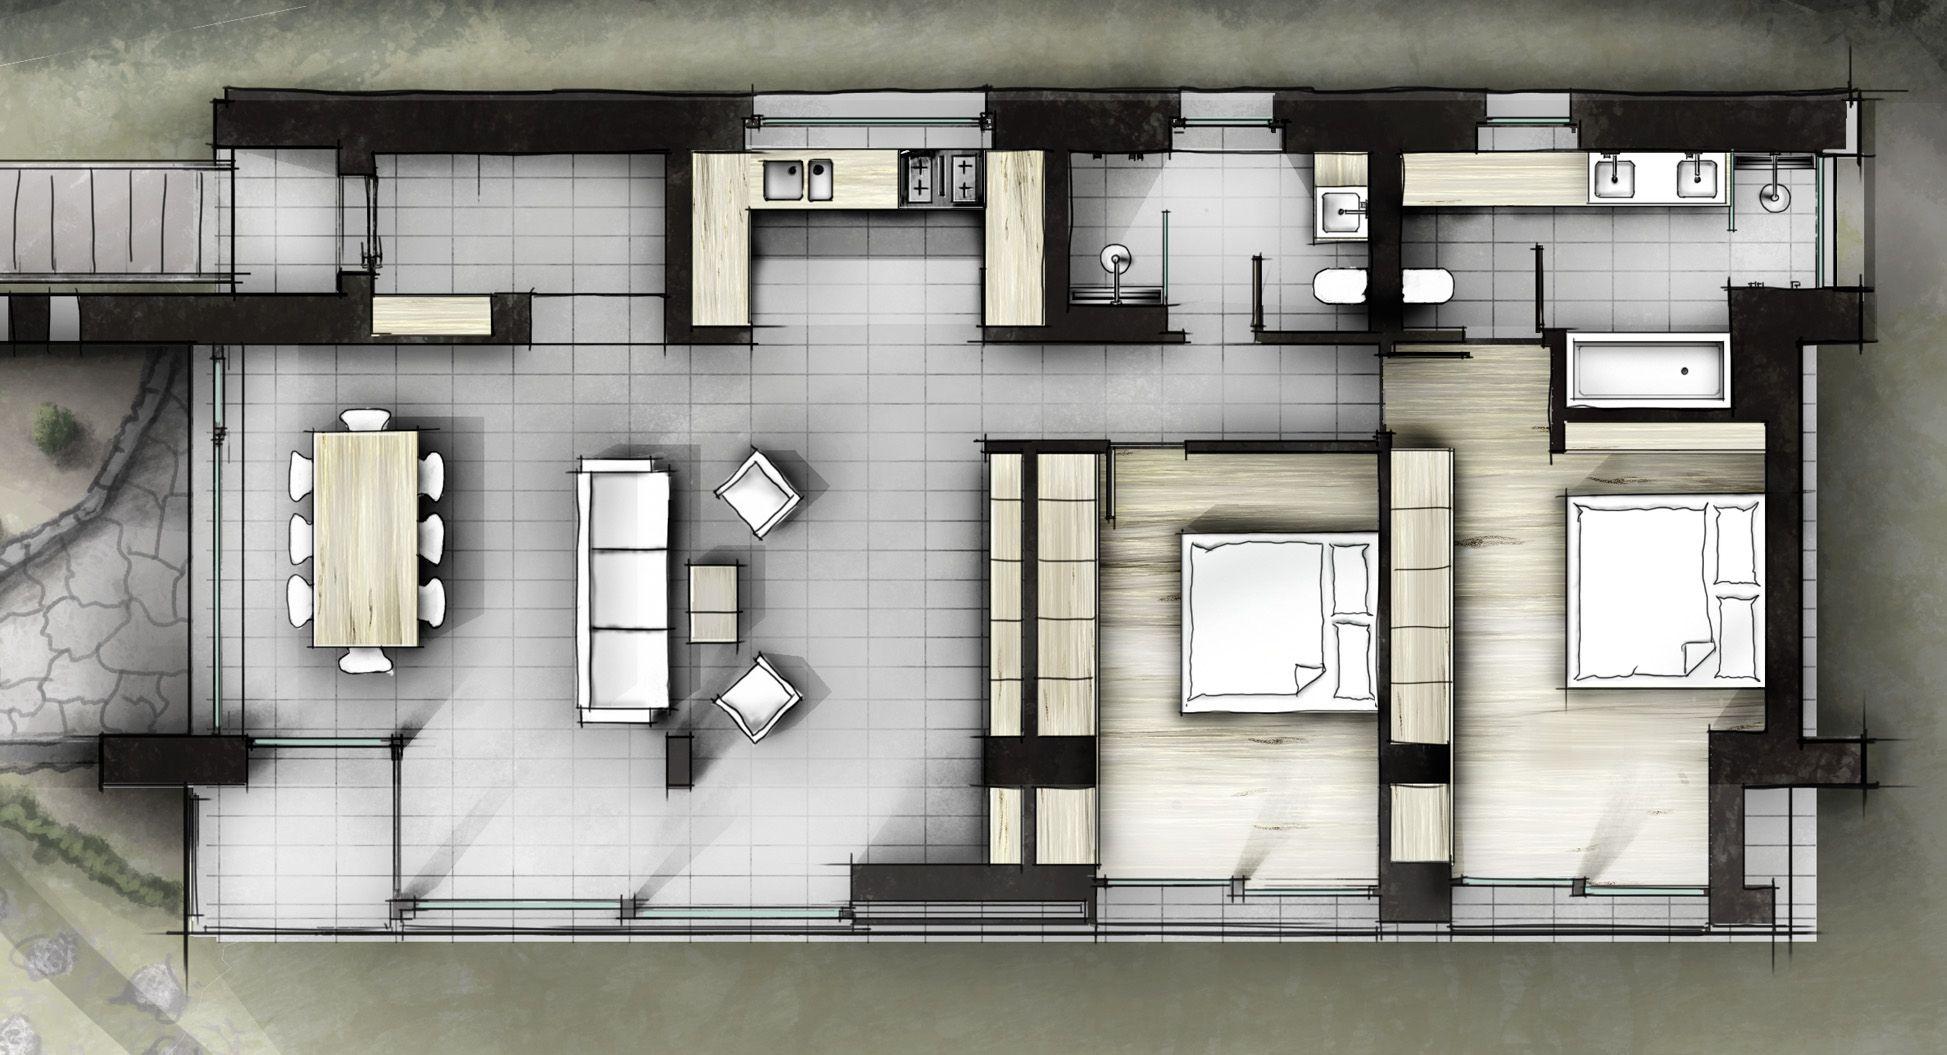 Innenarchitektur skizze grundriss  Entwurf_Wohnhaus2 | Innenarchitektur Zeichnungen Skizzen No-Render ...